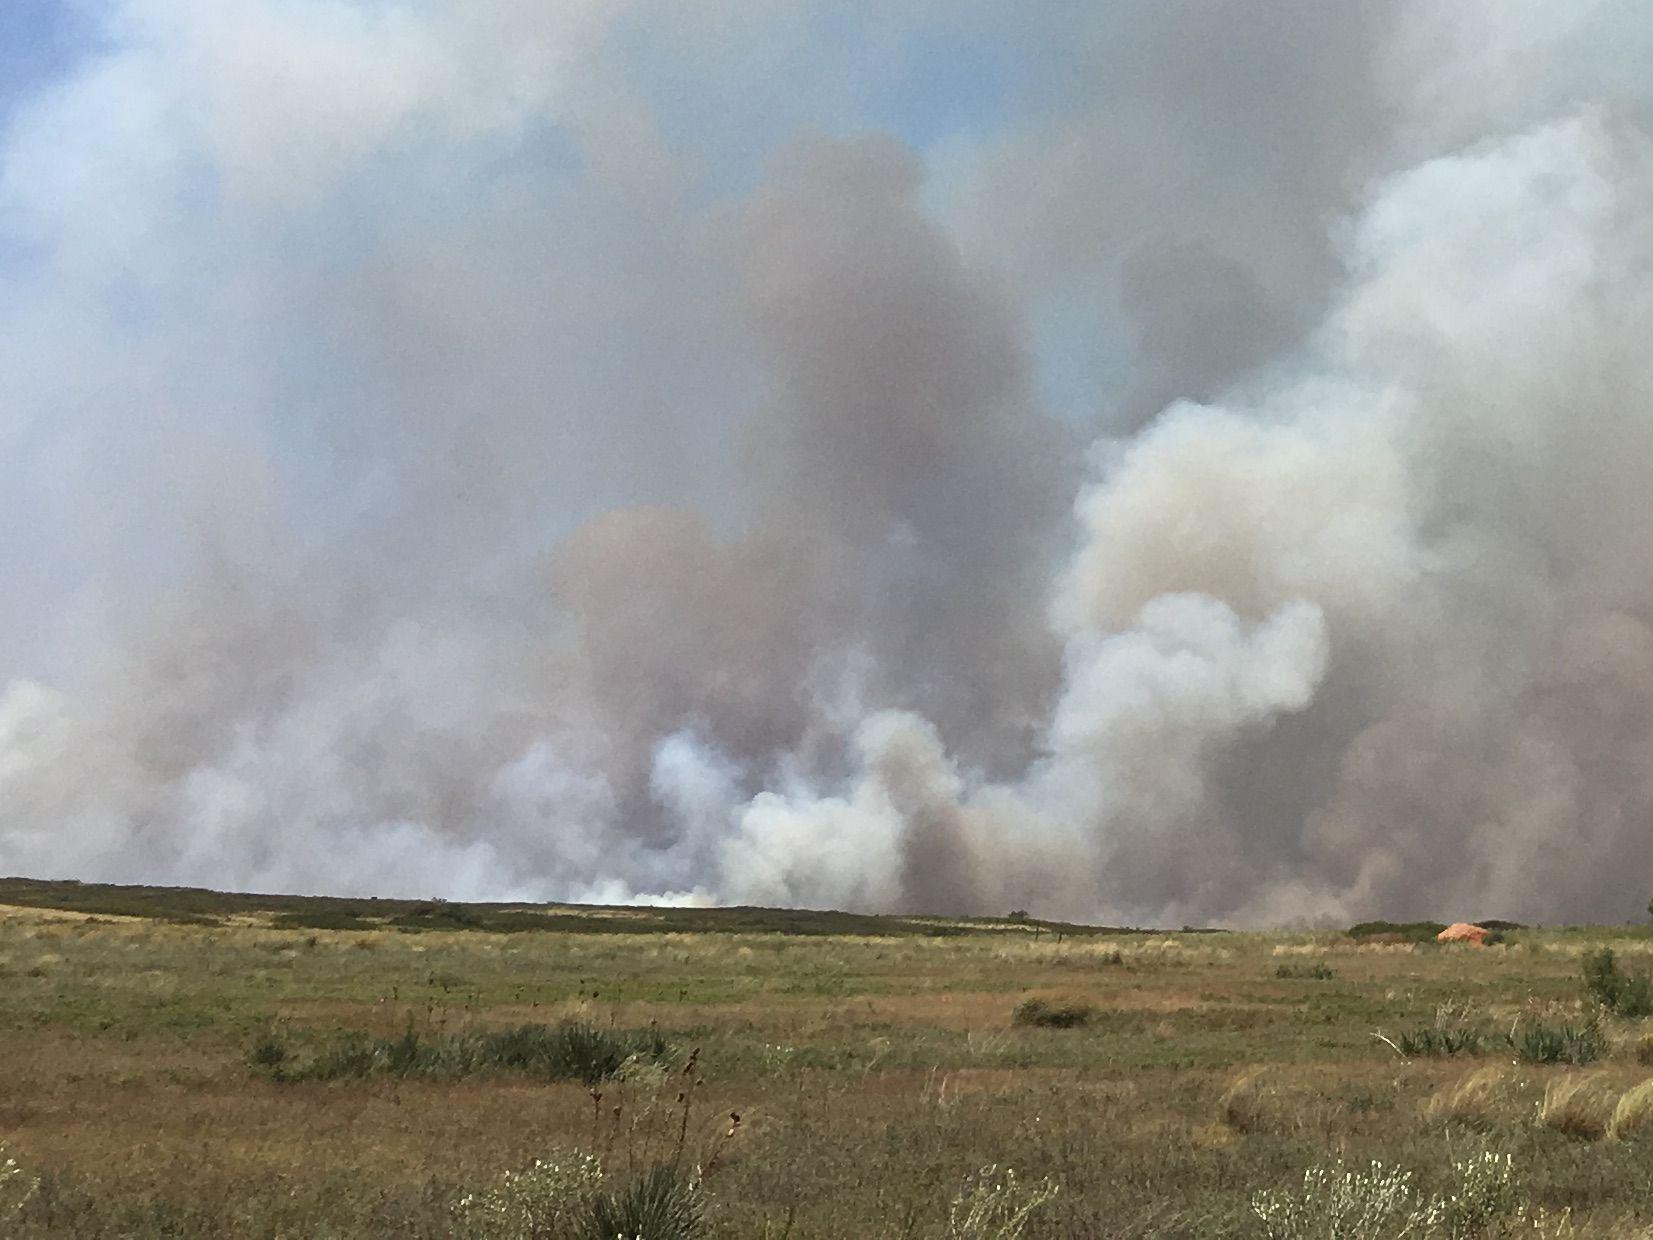 PHOTOS: Firenado from Bird Ranch fire NE of Paducah